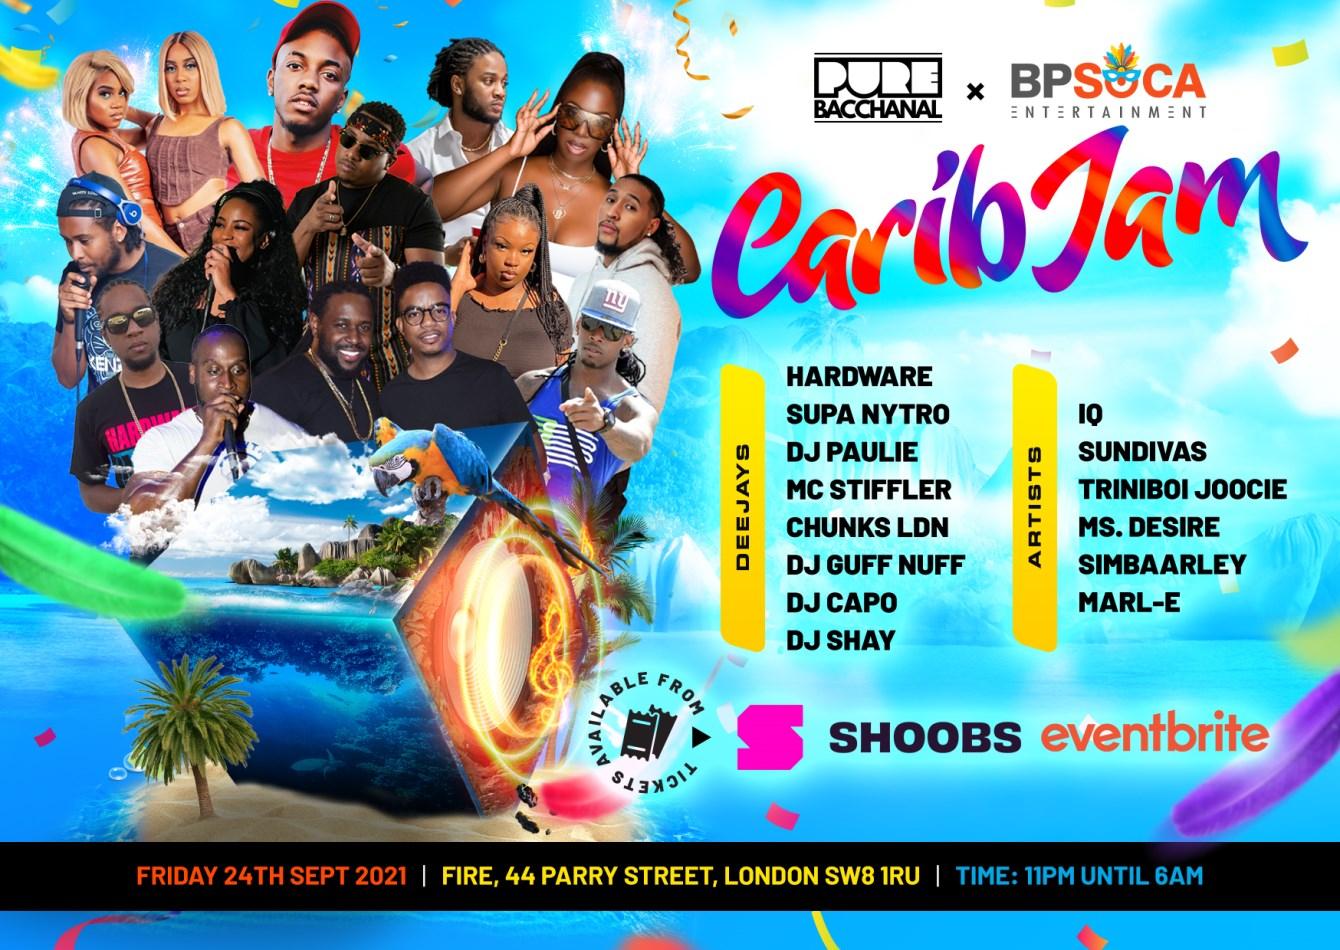 Pure Bacchanal - Carib JAM - Flyer back